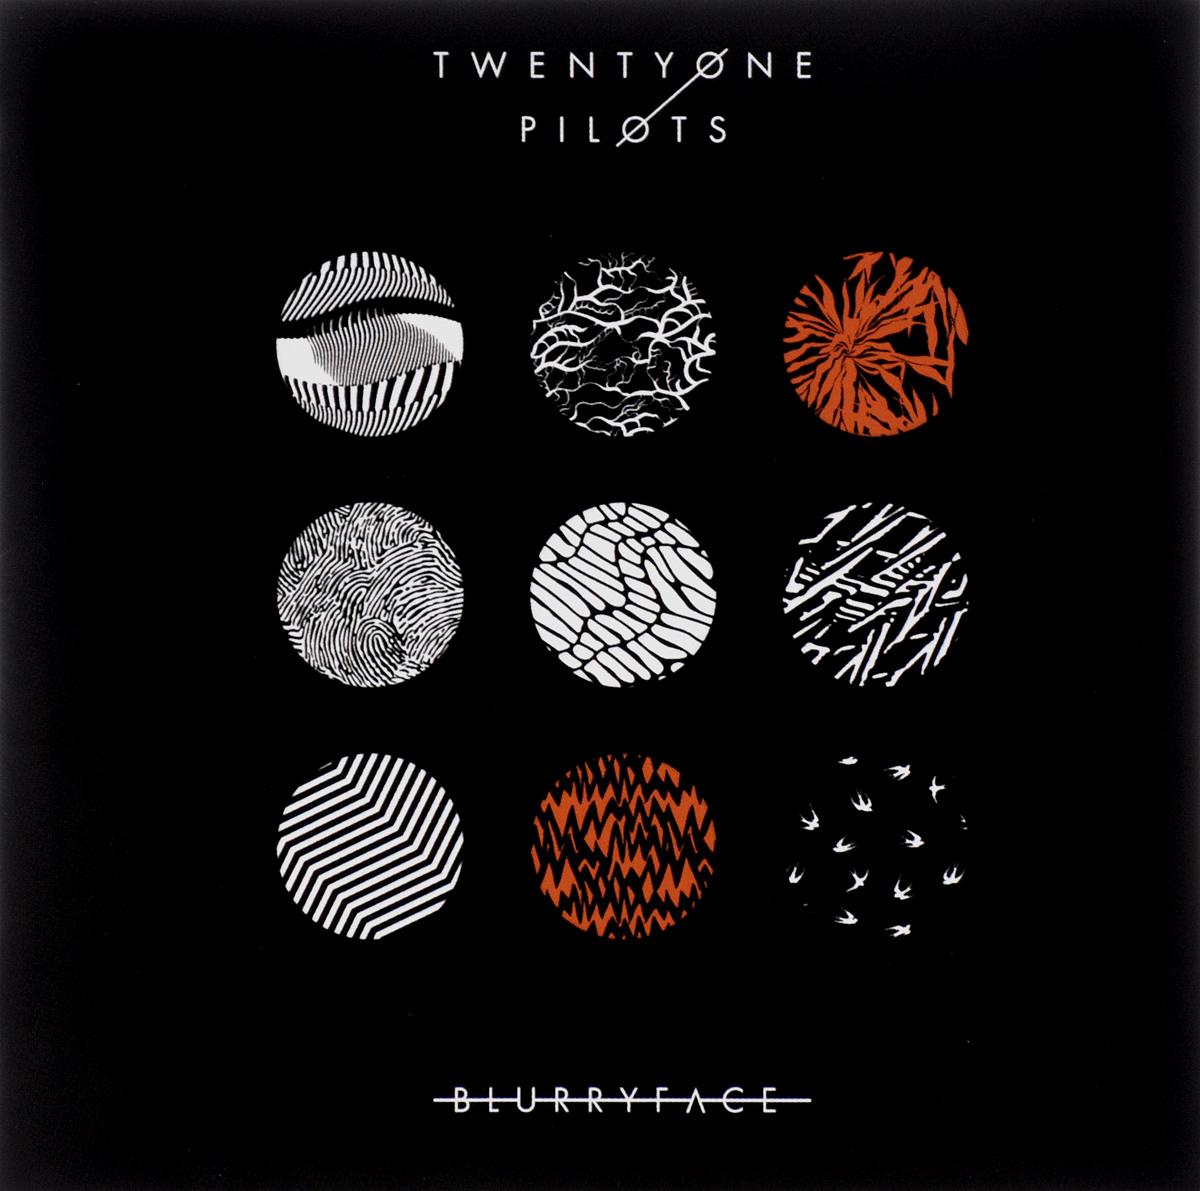 Twenty One Pilots Twenty One Pilots: Blurryface twenty one pilots birmingham